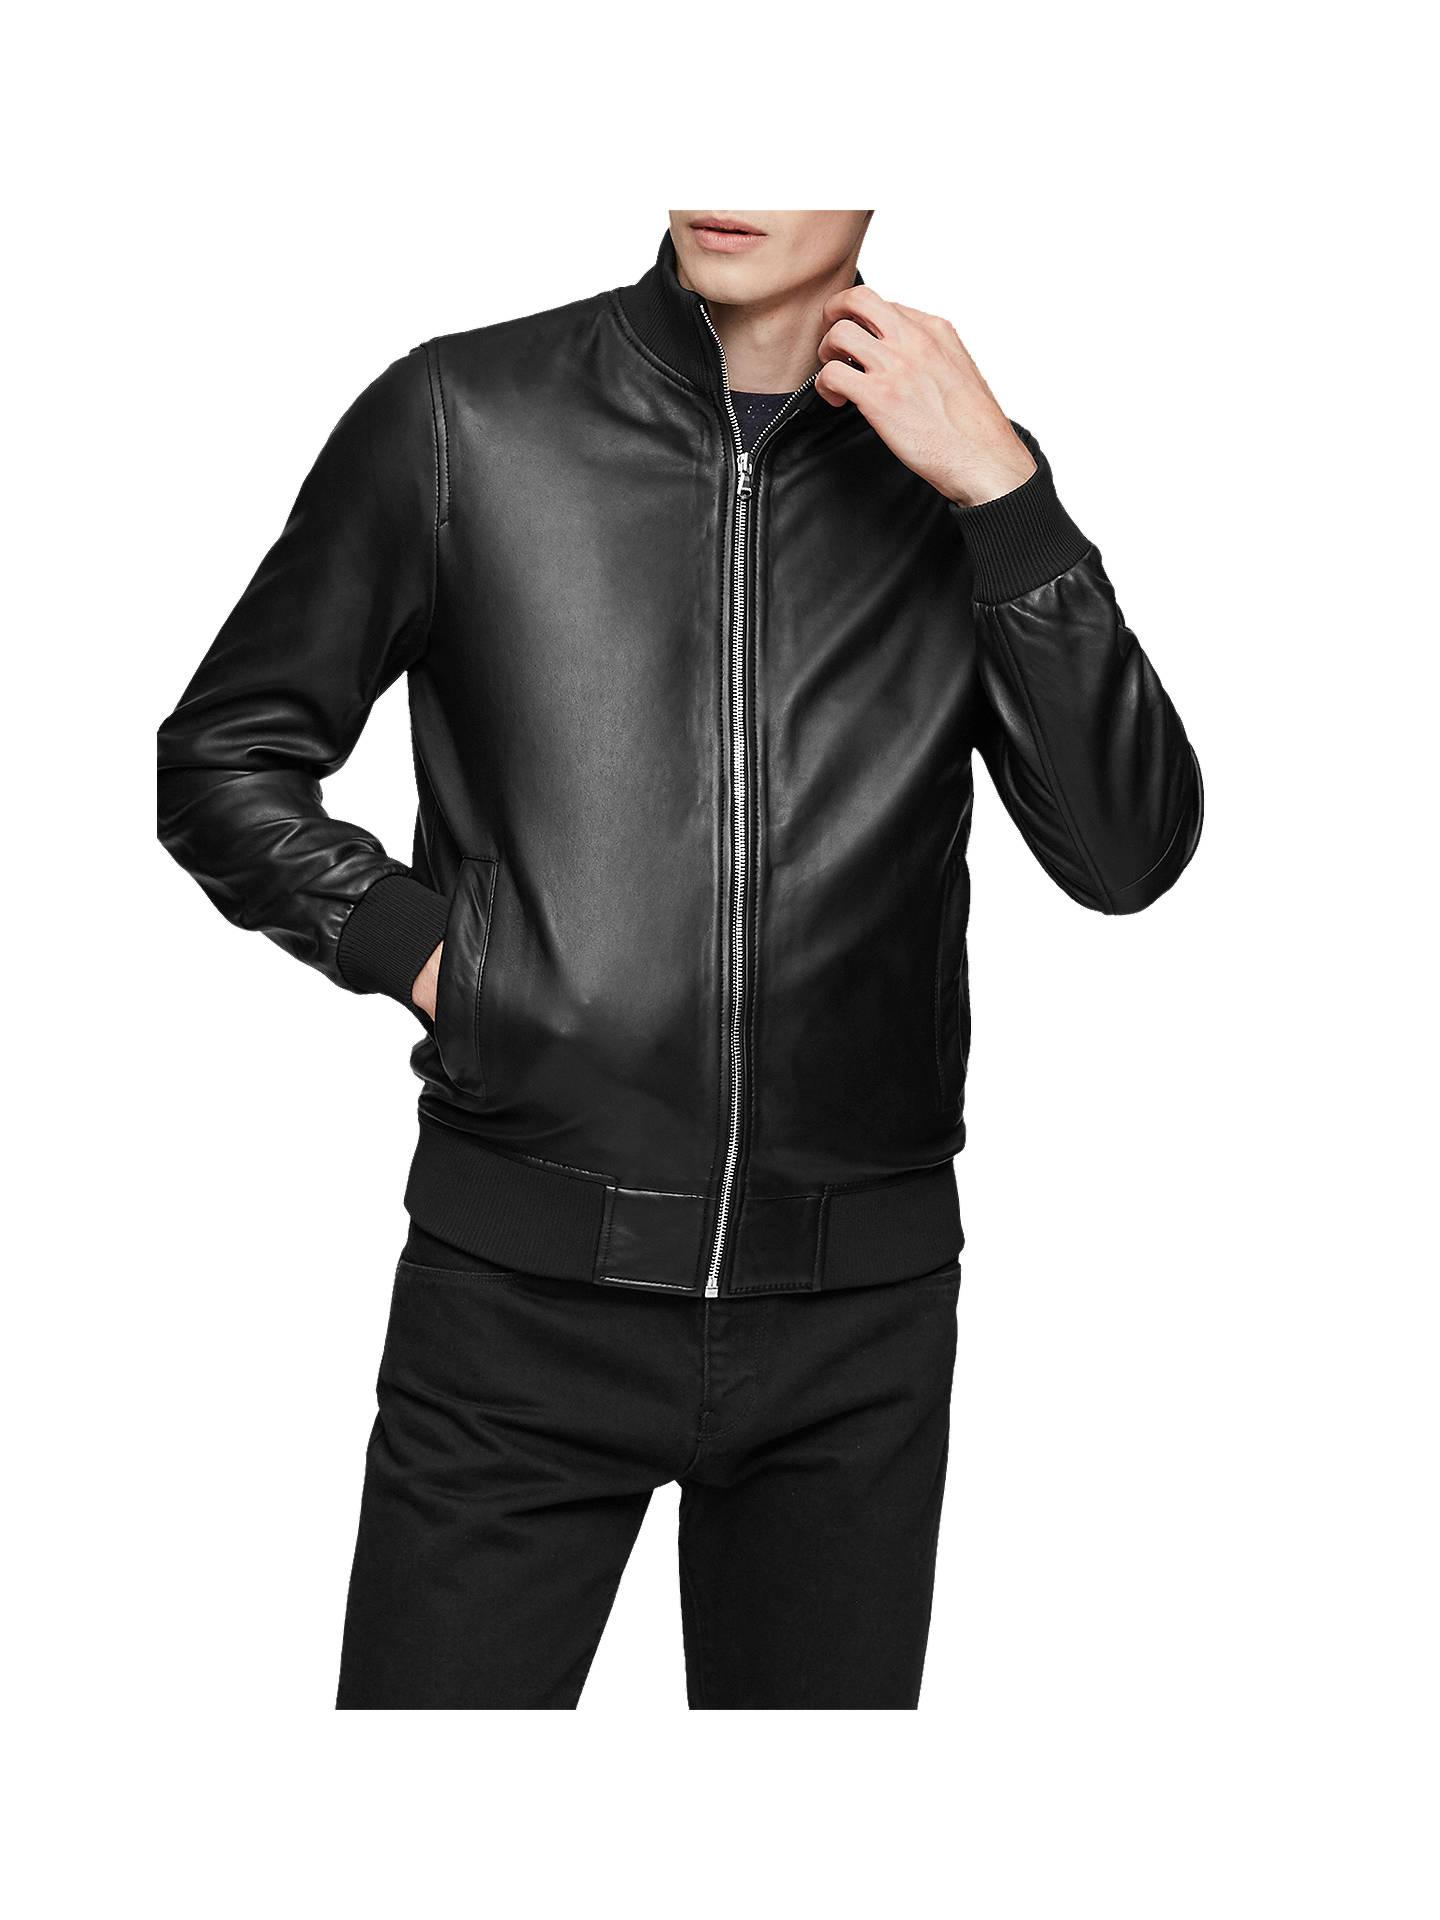 30c395c10 Reiss Mars Leather Bomber Jacket, Black at John Lewis & Partners